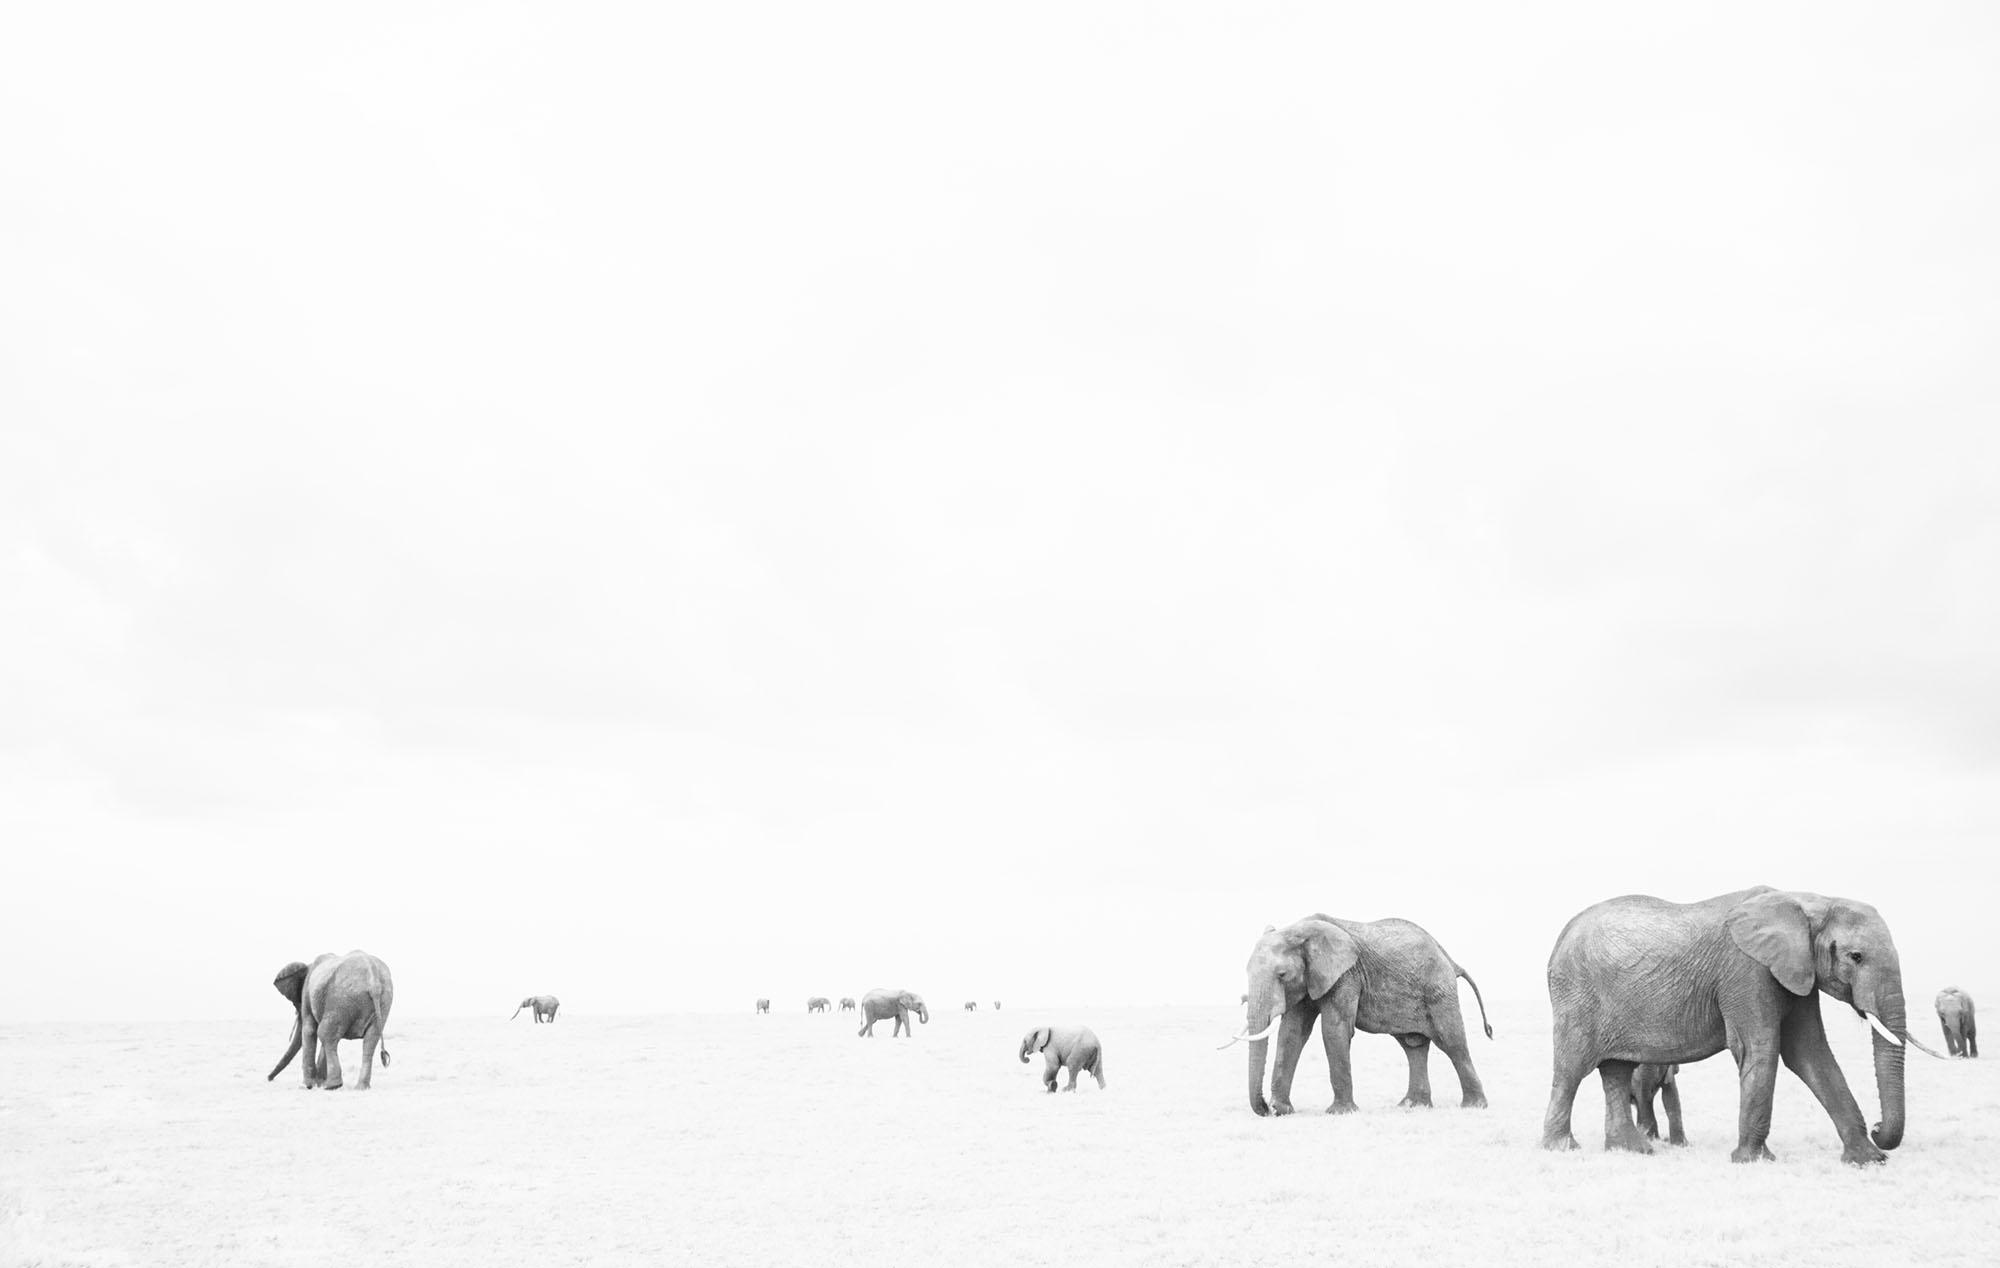 African elephant (Loxodonta africana). Maasai Mara National Reserve, Kenya. July 2017.